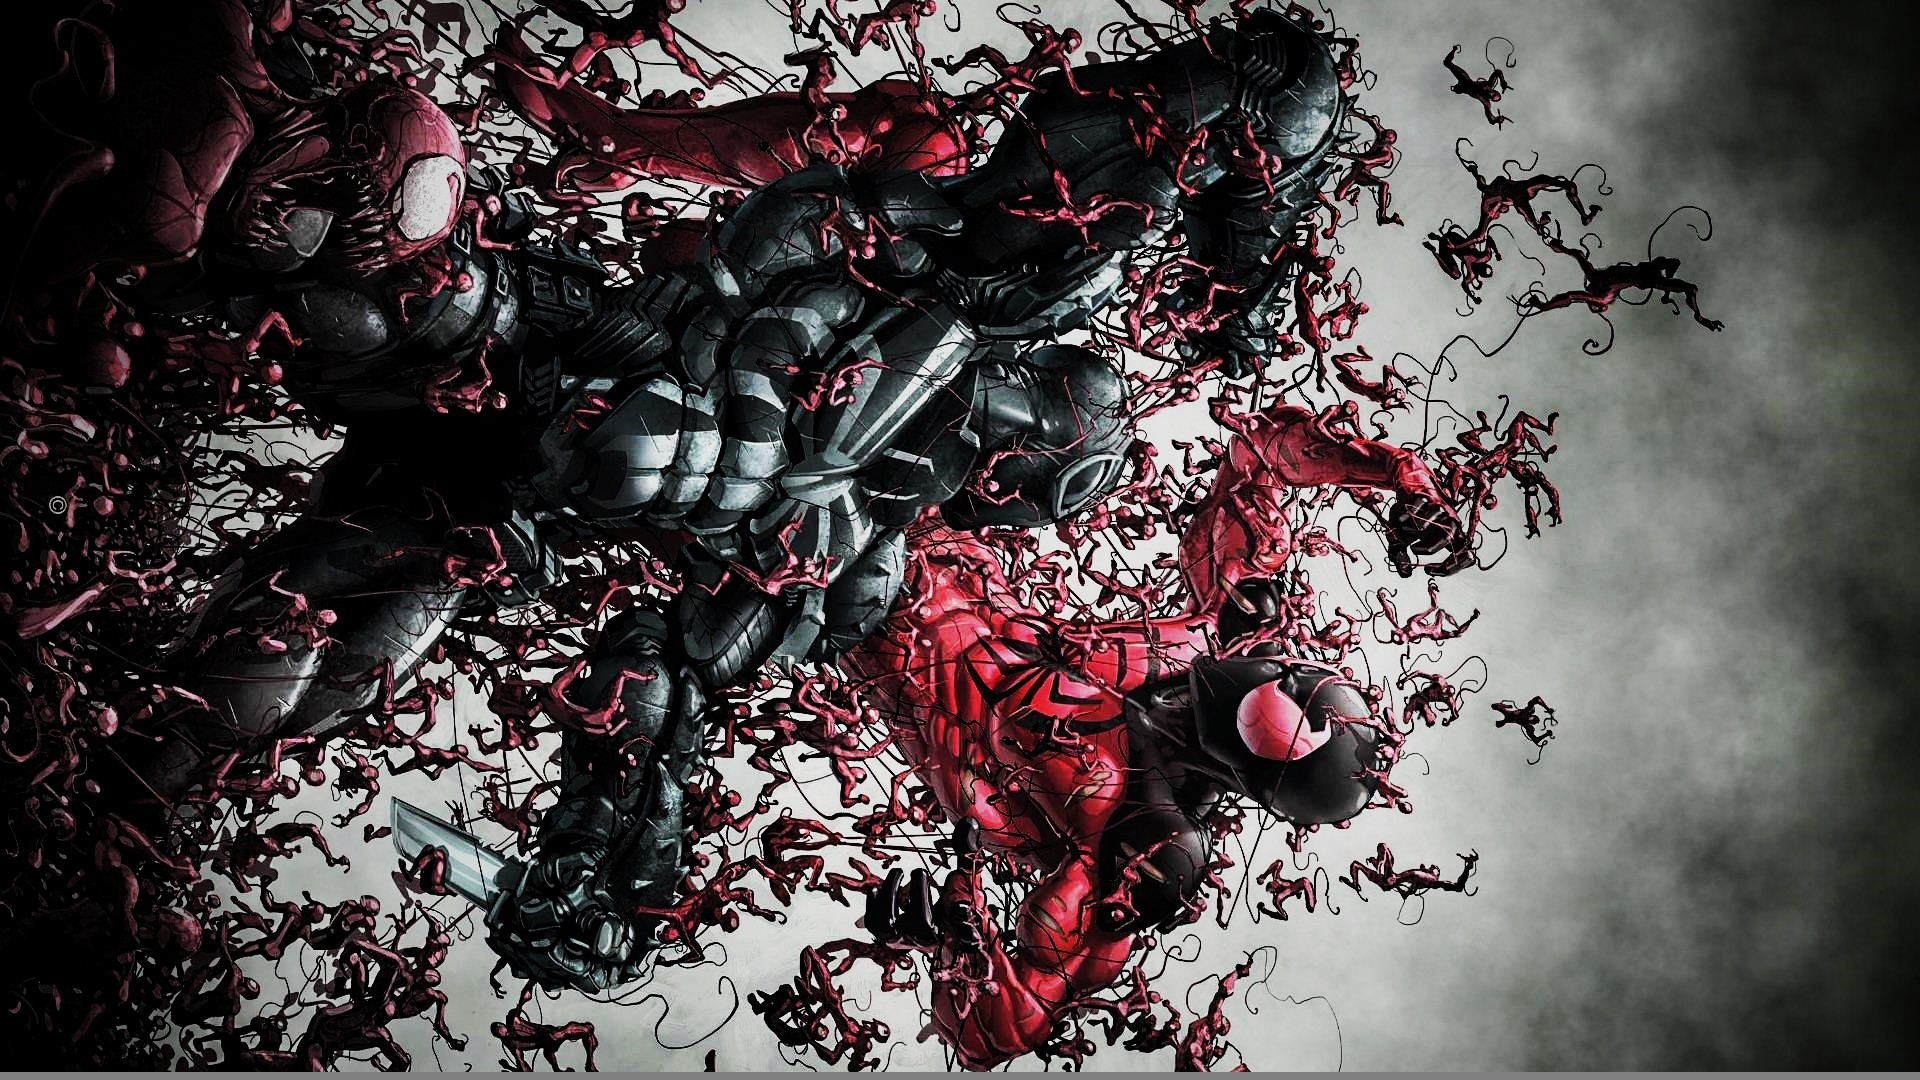 Agent Venom Vs. The Scarlet Spider by ProfessorAdagio on DeviantArt